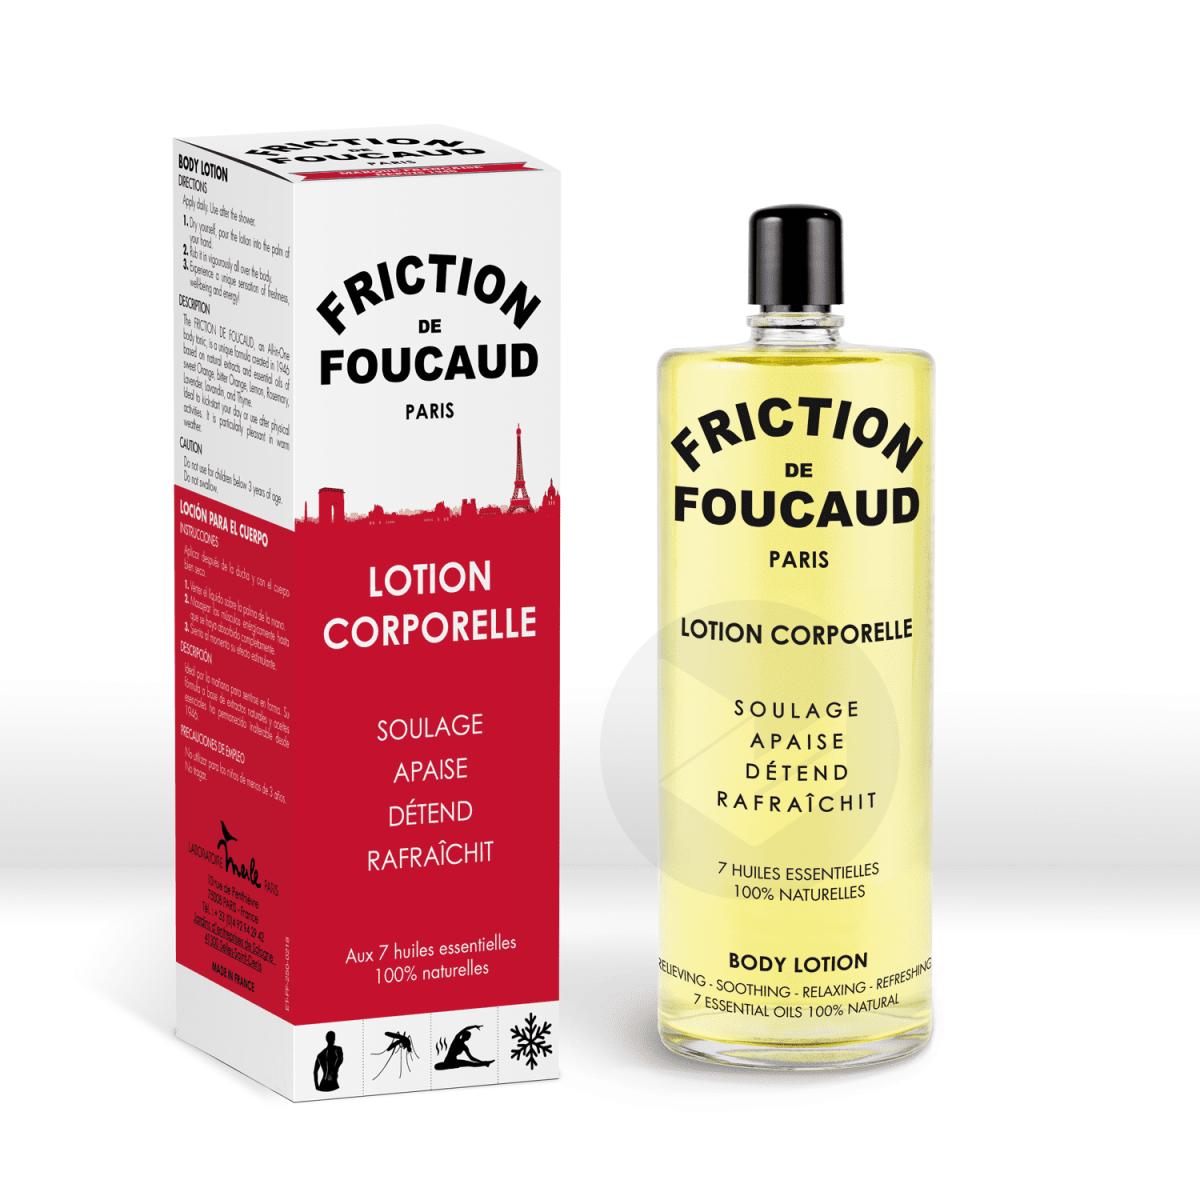 Friction de Foucaud250ml